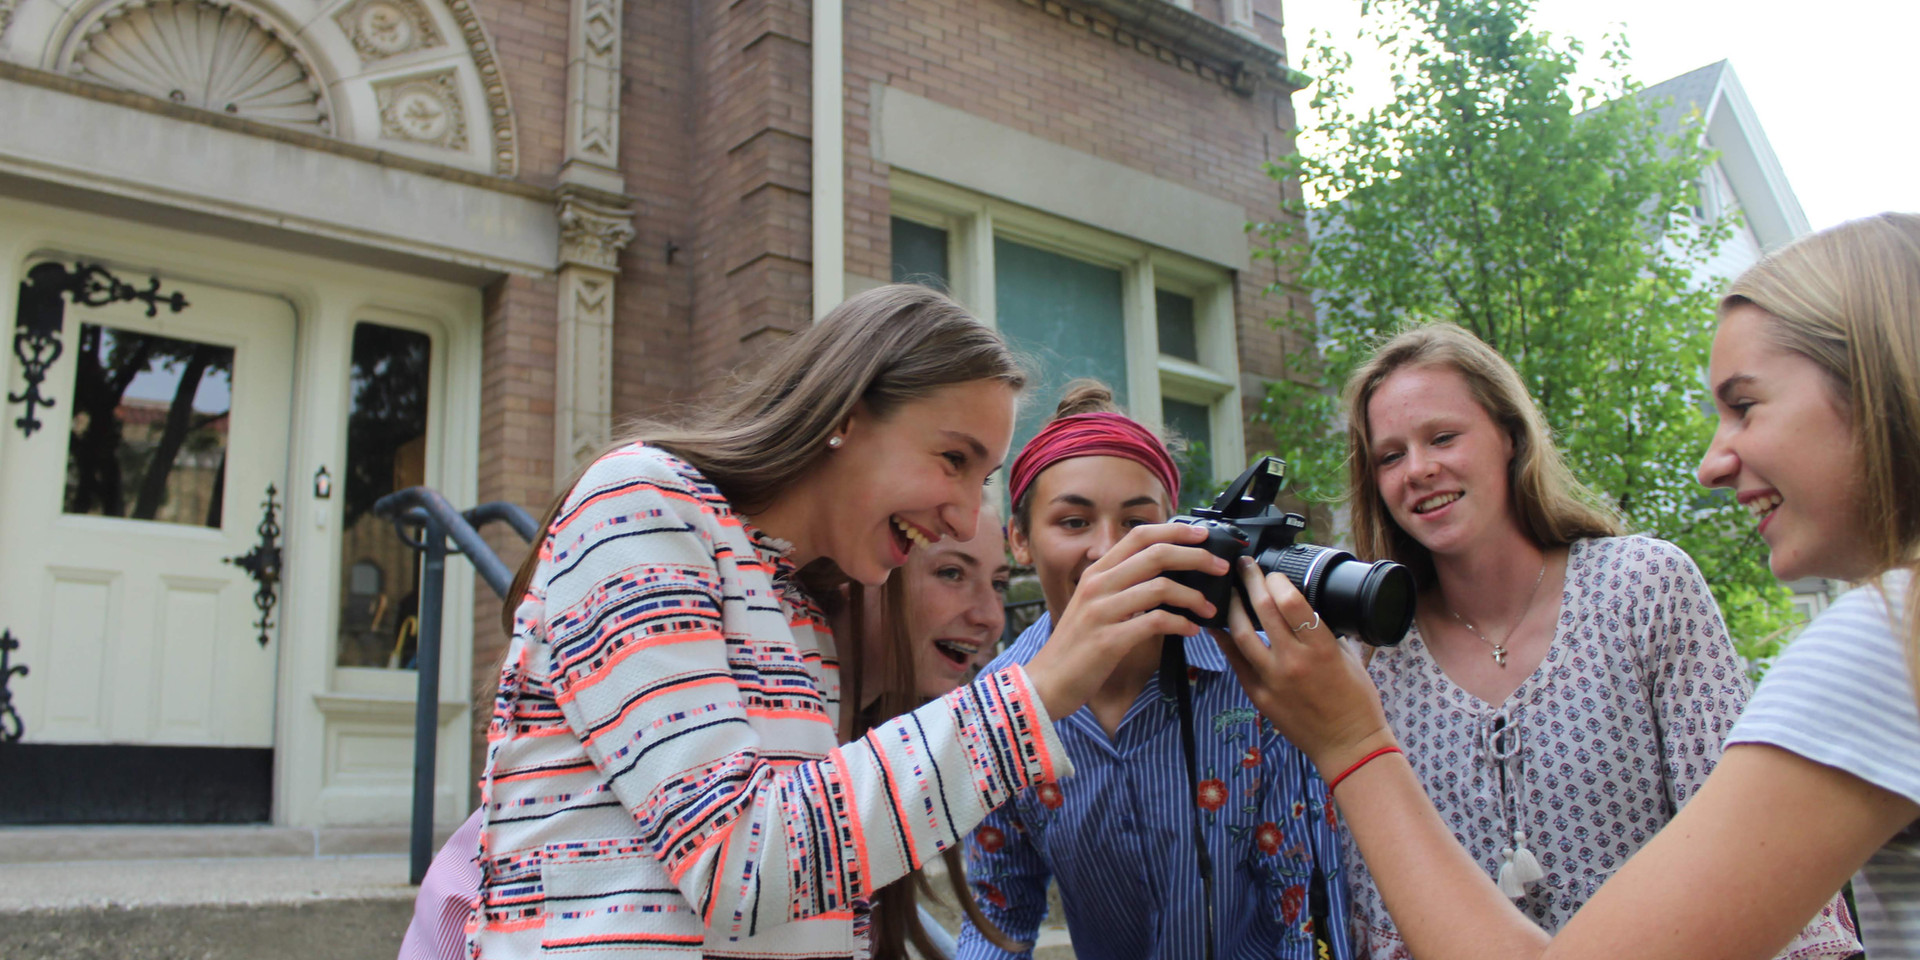 2019 36 girls with camera.jpg